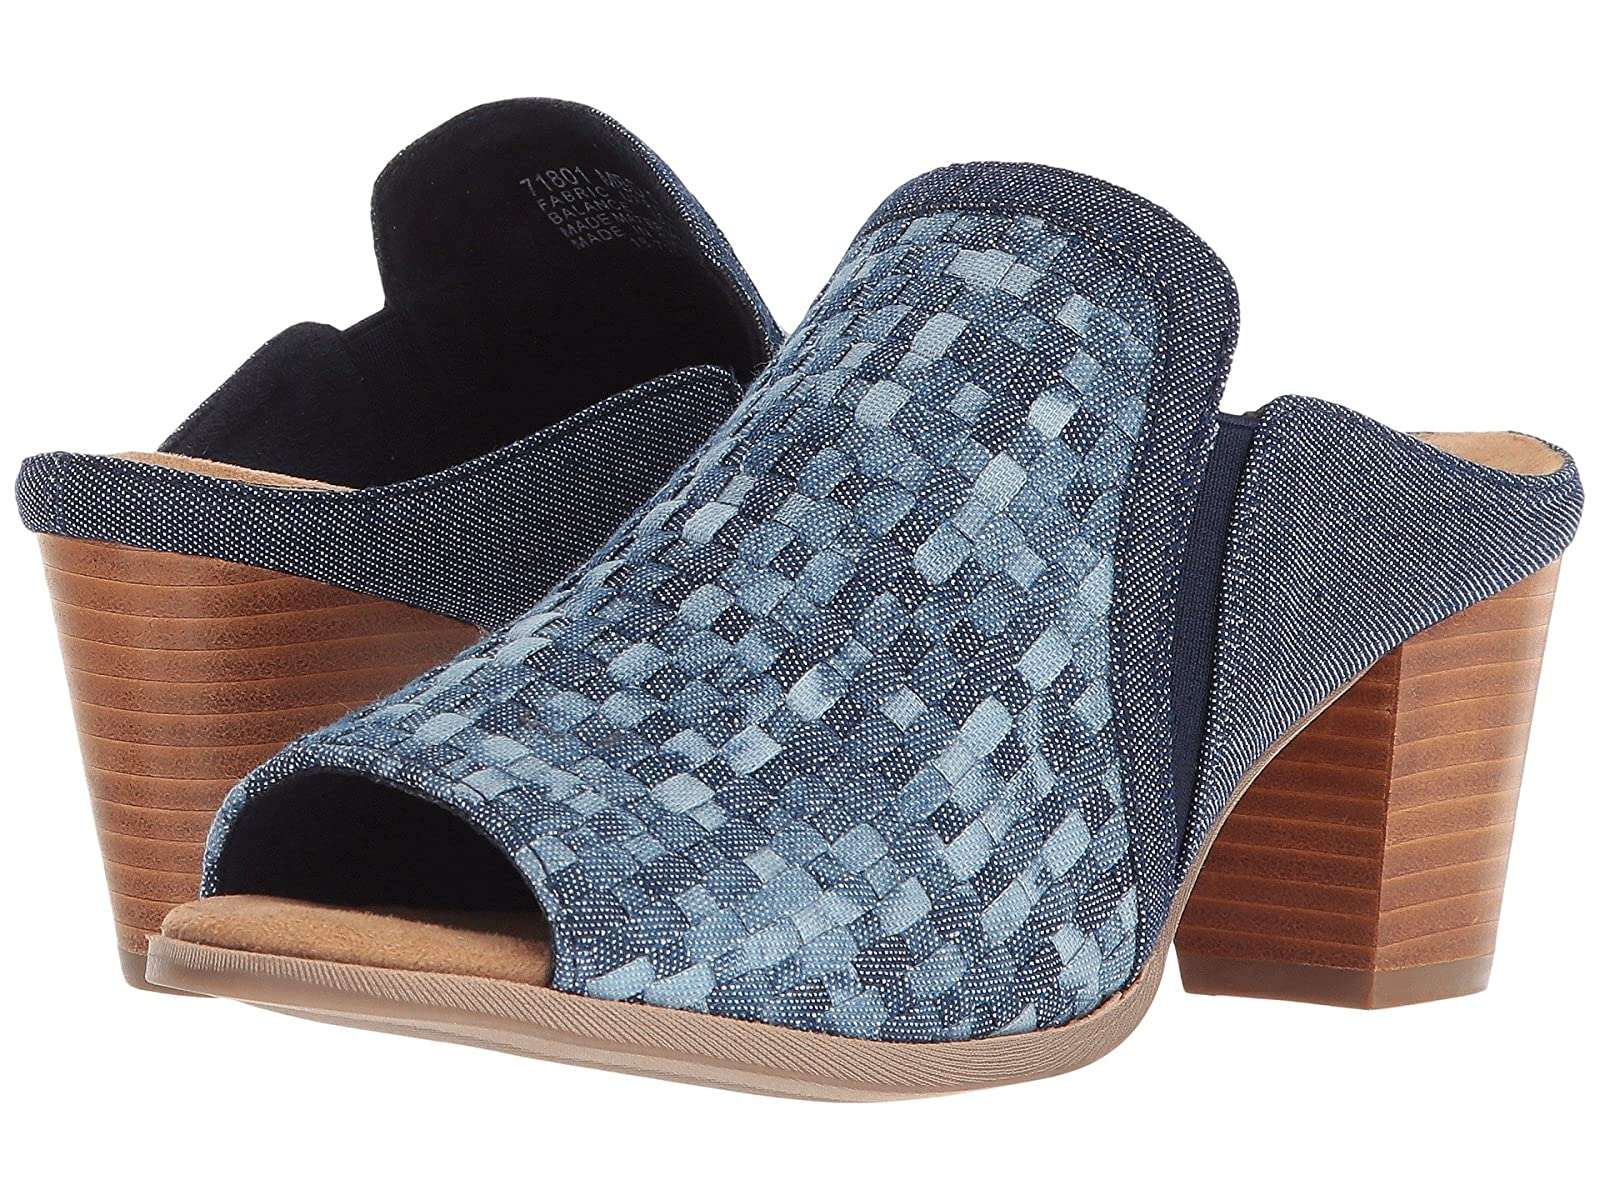 Minnetonka MonaAtmospheric grades have affordable shoes